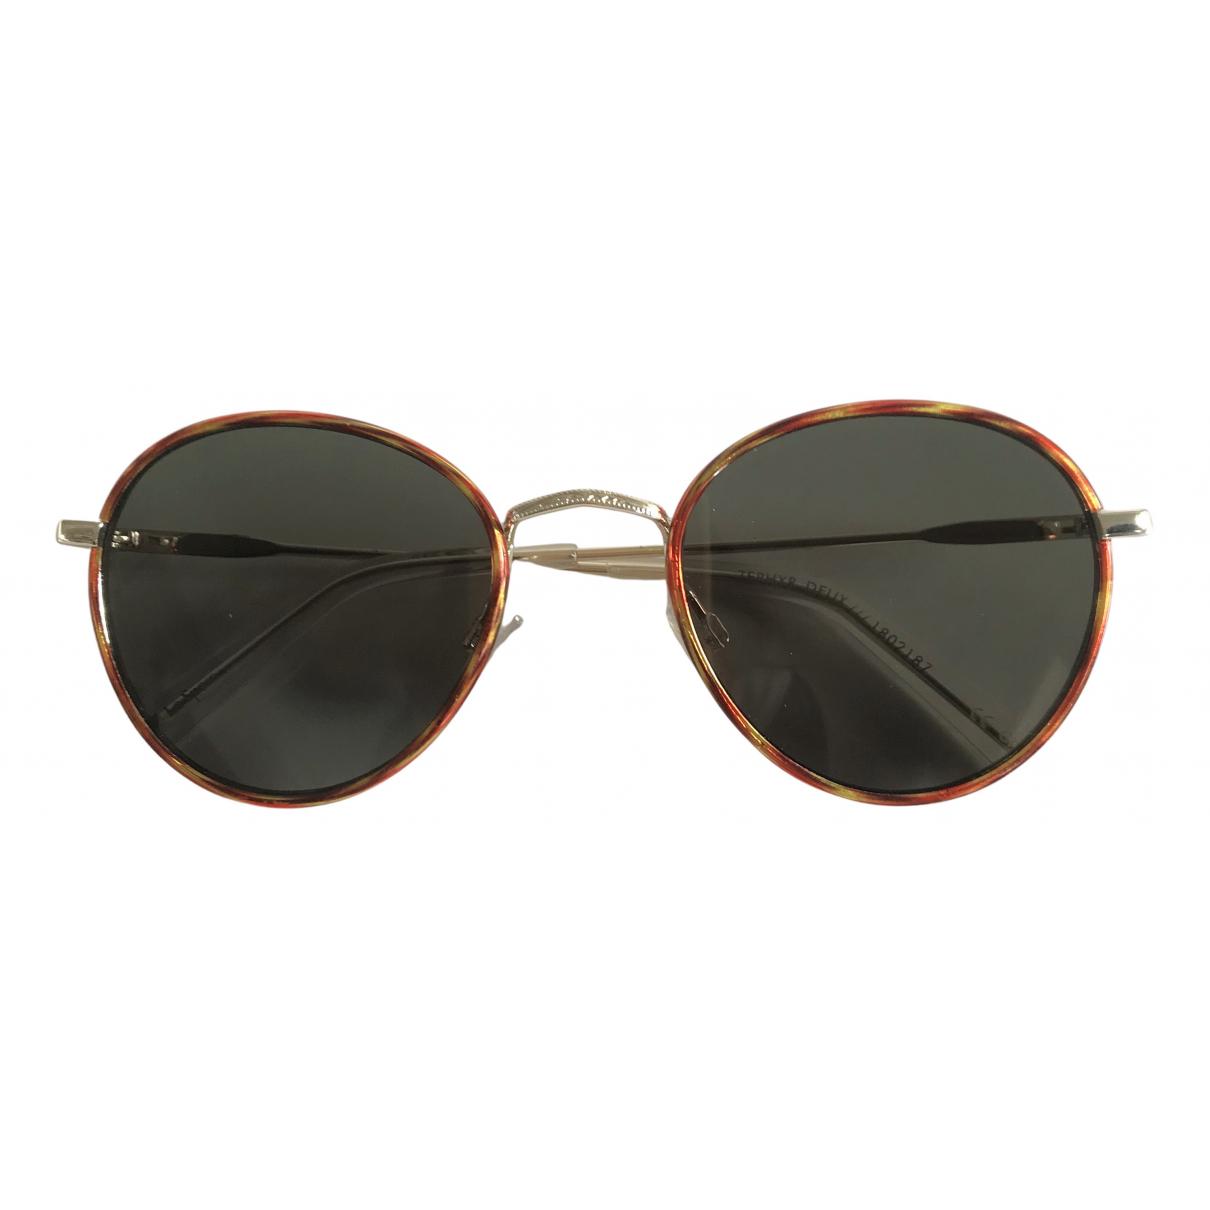 Le Specs N Green Metal Sunglasses for Women N